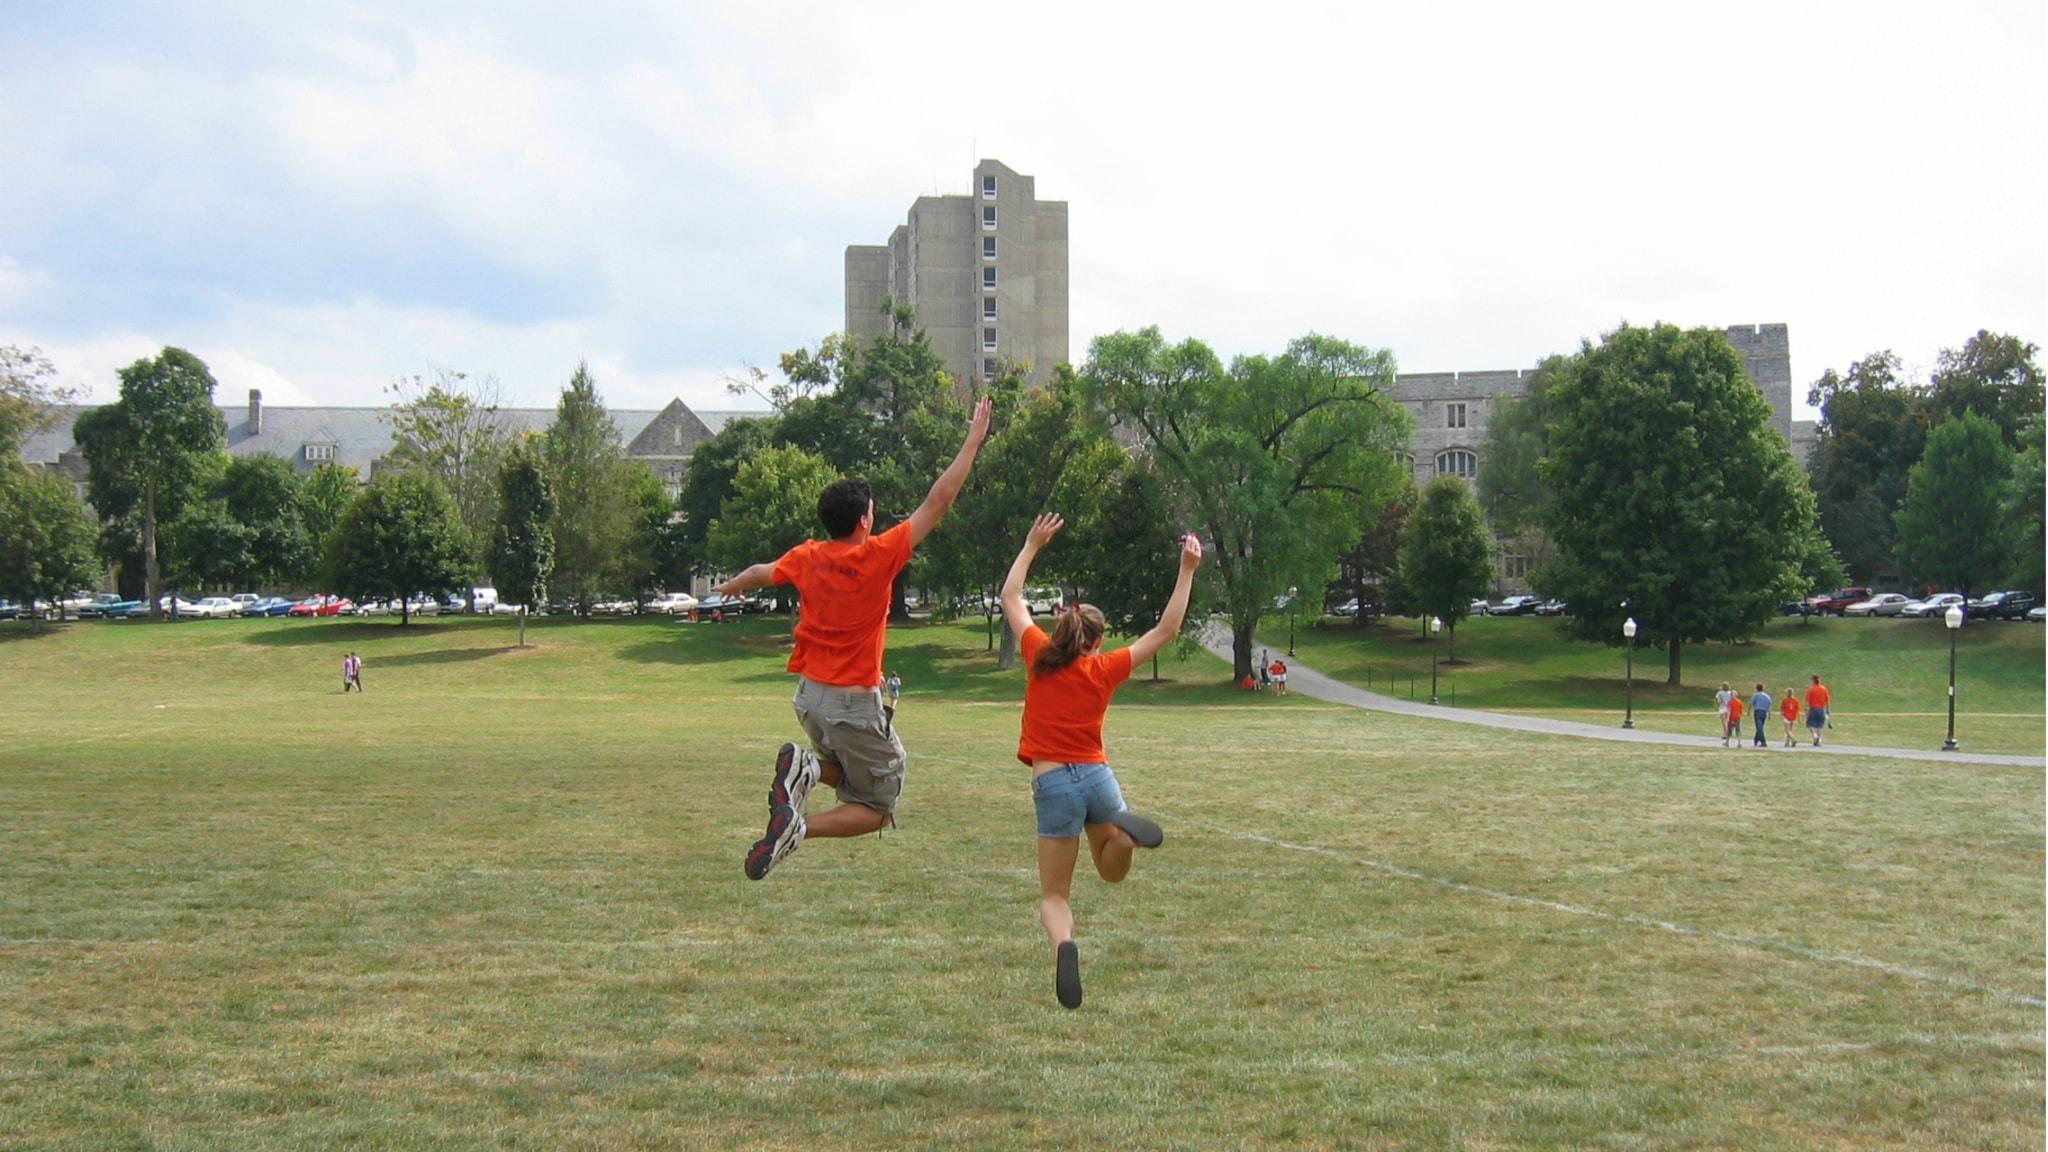 Två personer hoppar Foto: Christopher Bowns https://flic.kr/p/5Brgh (CC BY-SA 2.0)